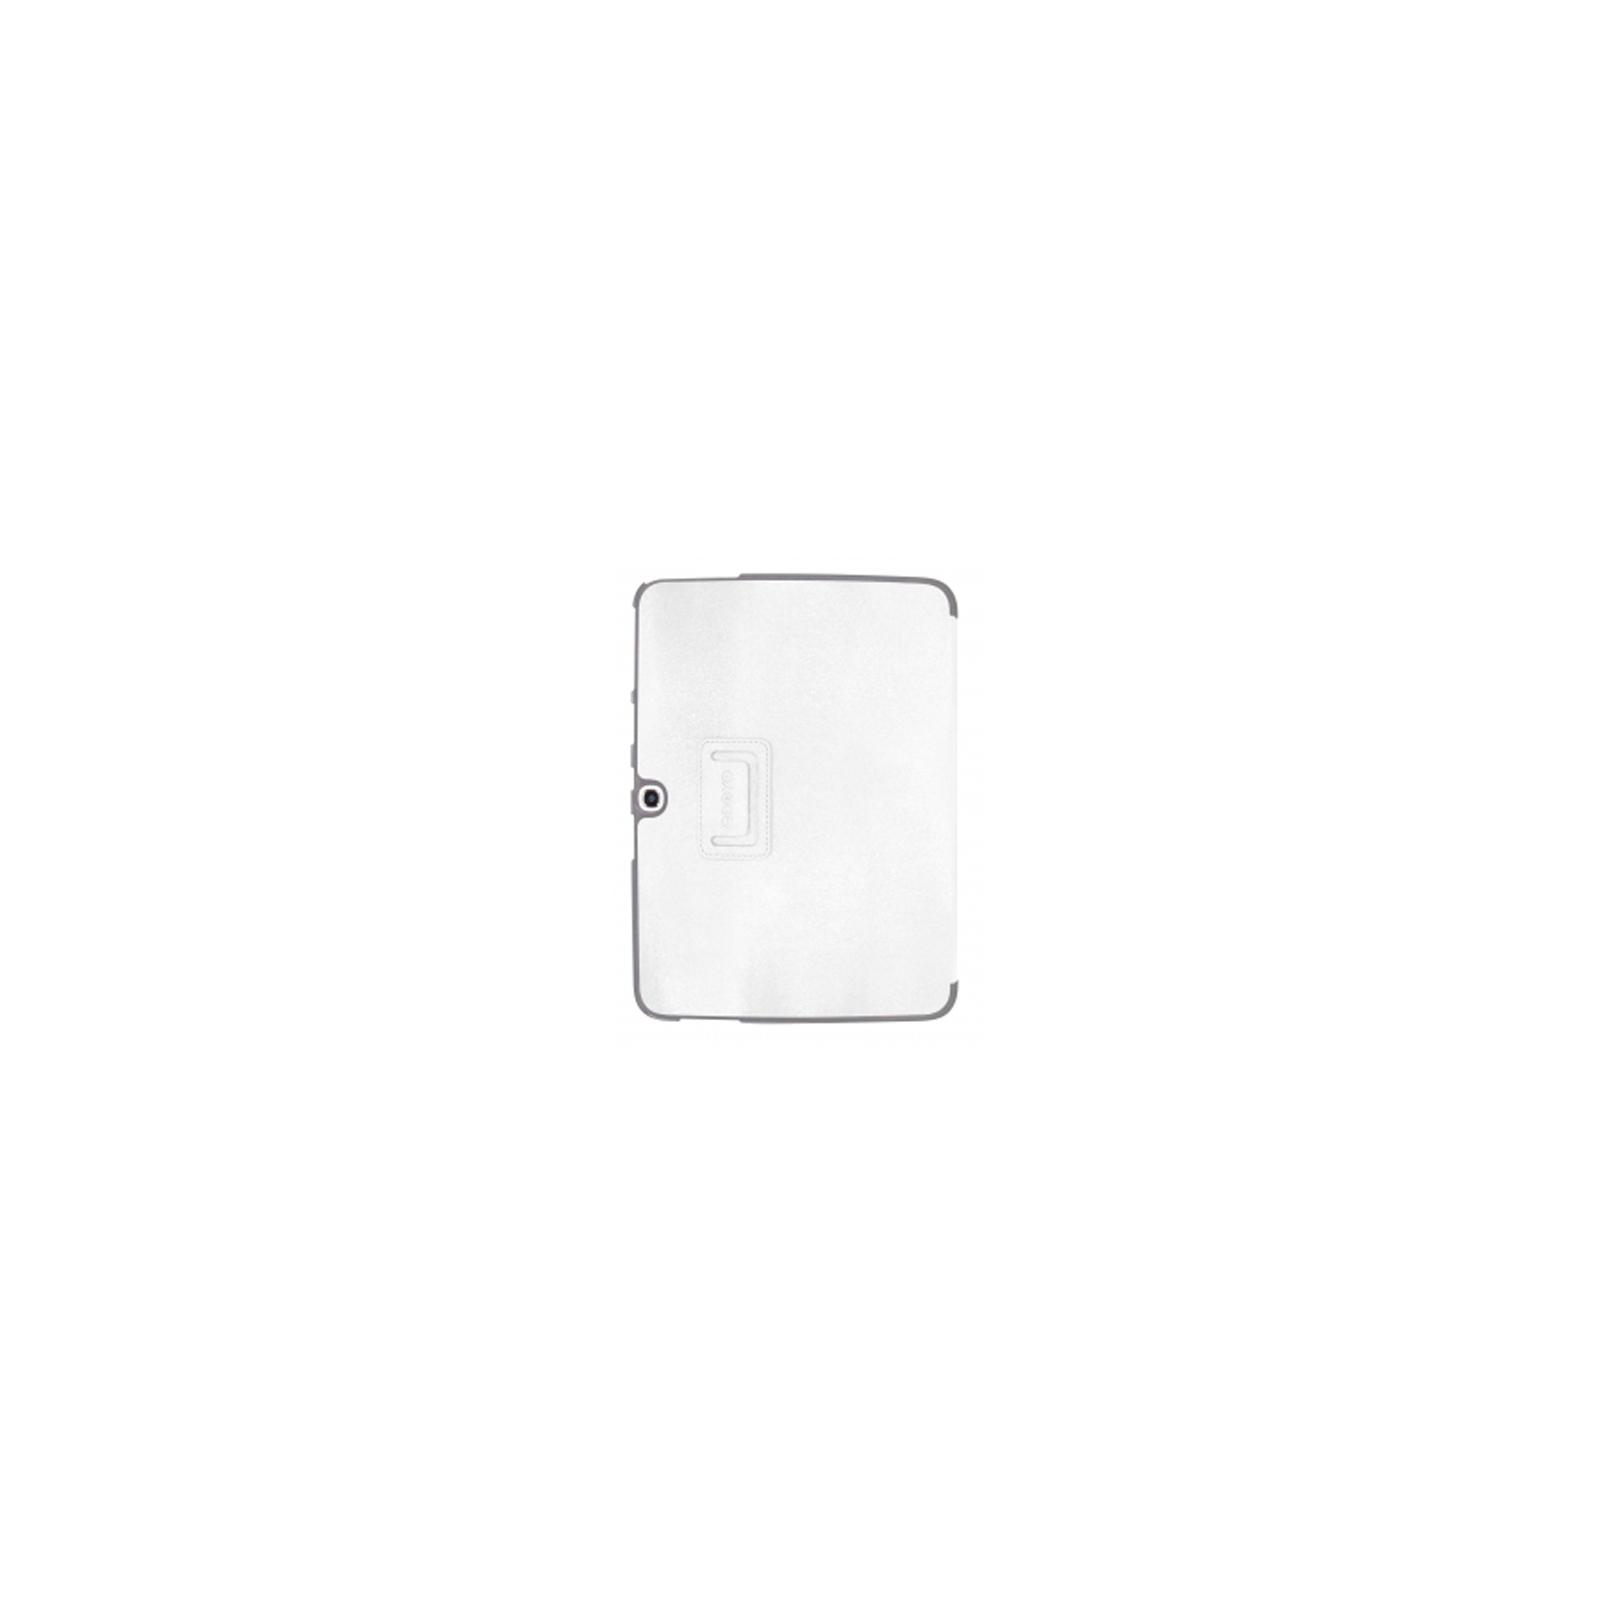 Чехол для планшета ODOYO Galaxy TAB3 10.1 /GLITZ COAT FOLIO COTTON WHITE (PH625WH) изображение 2